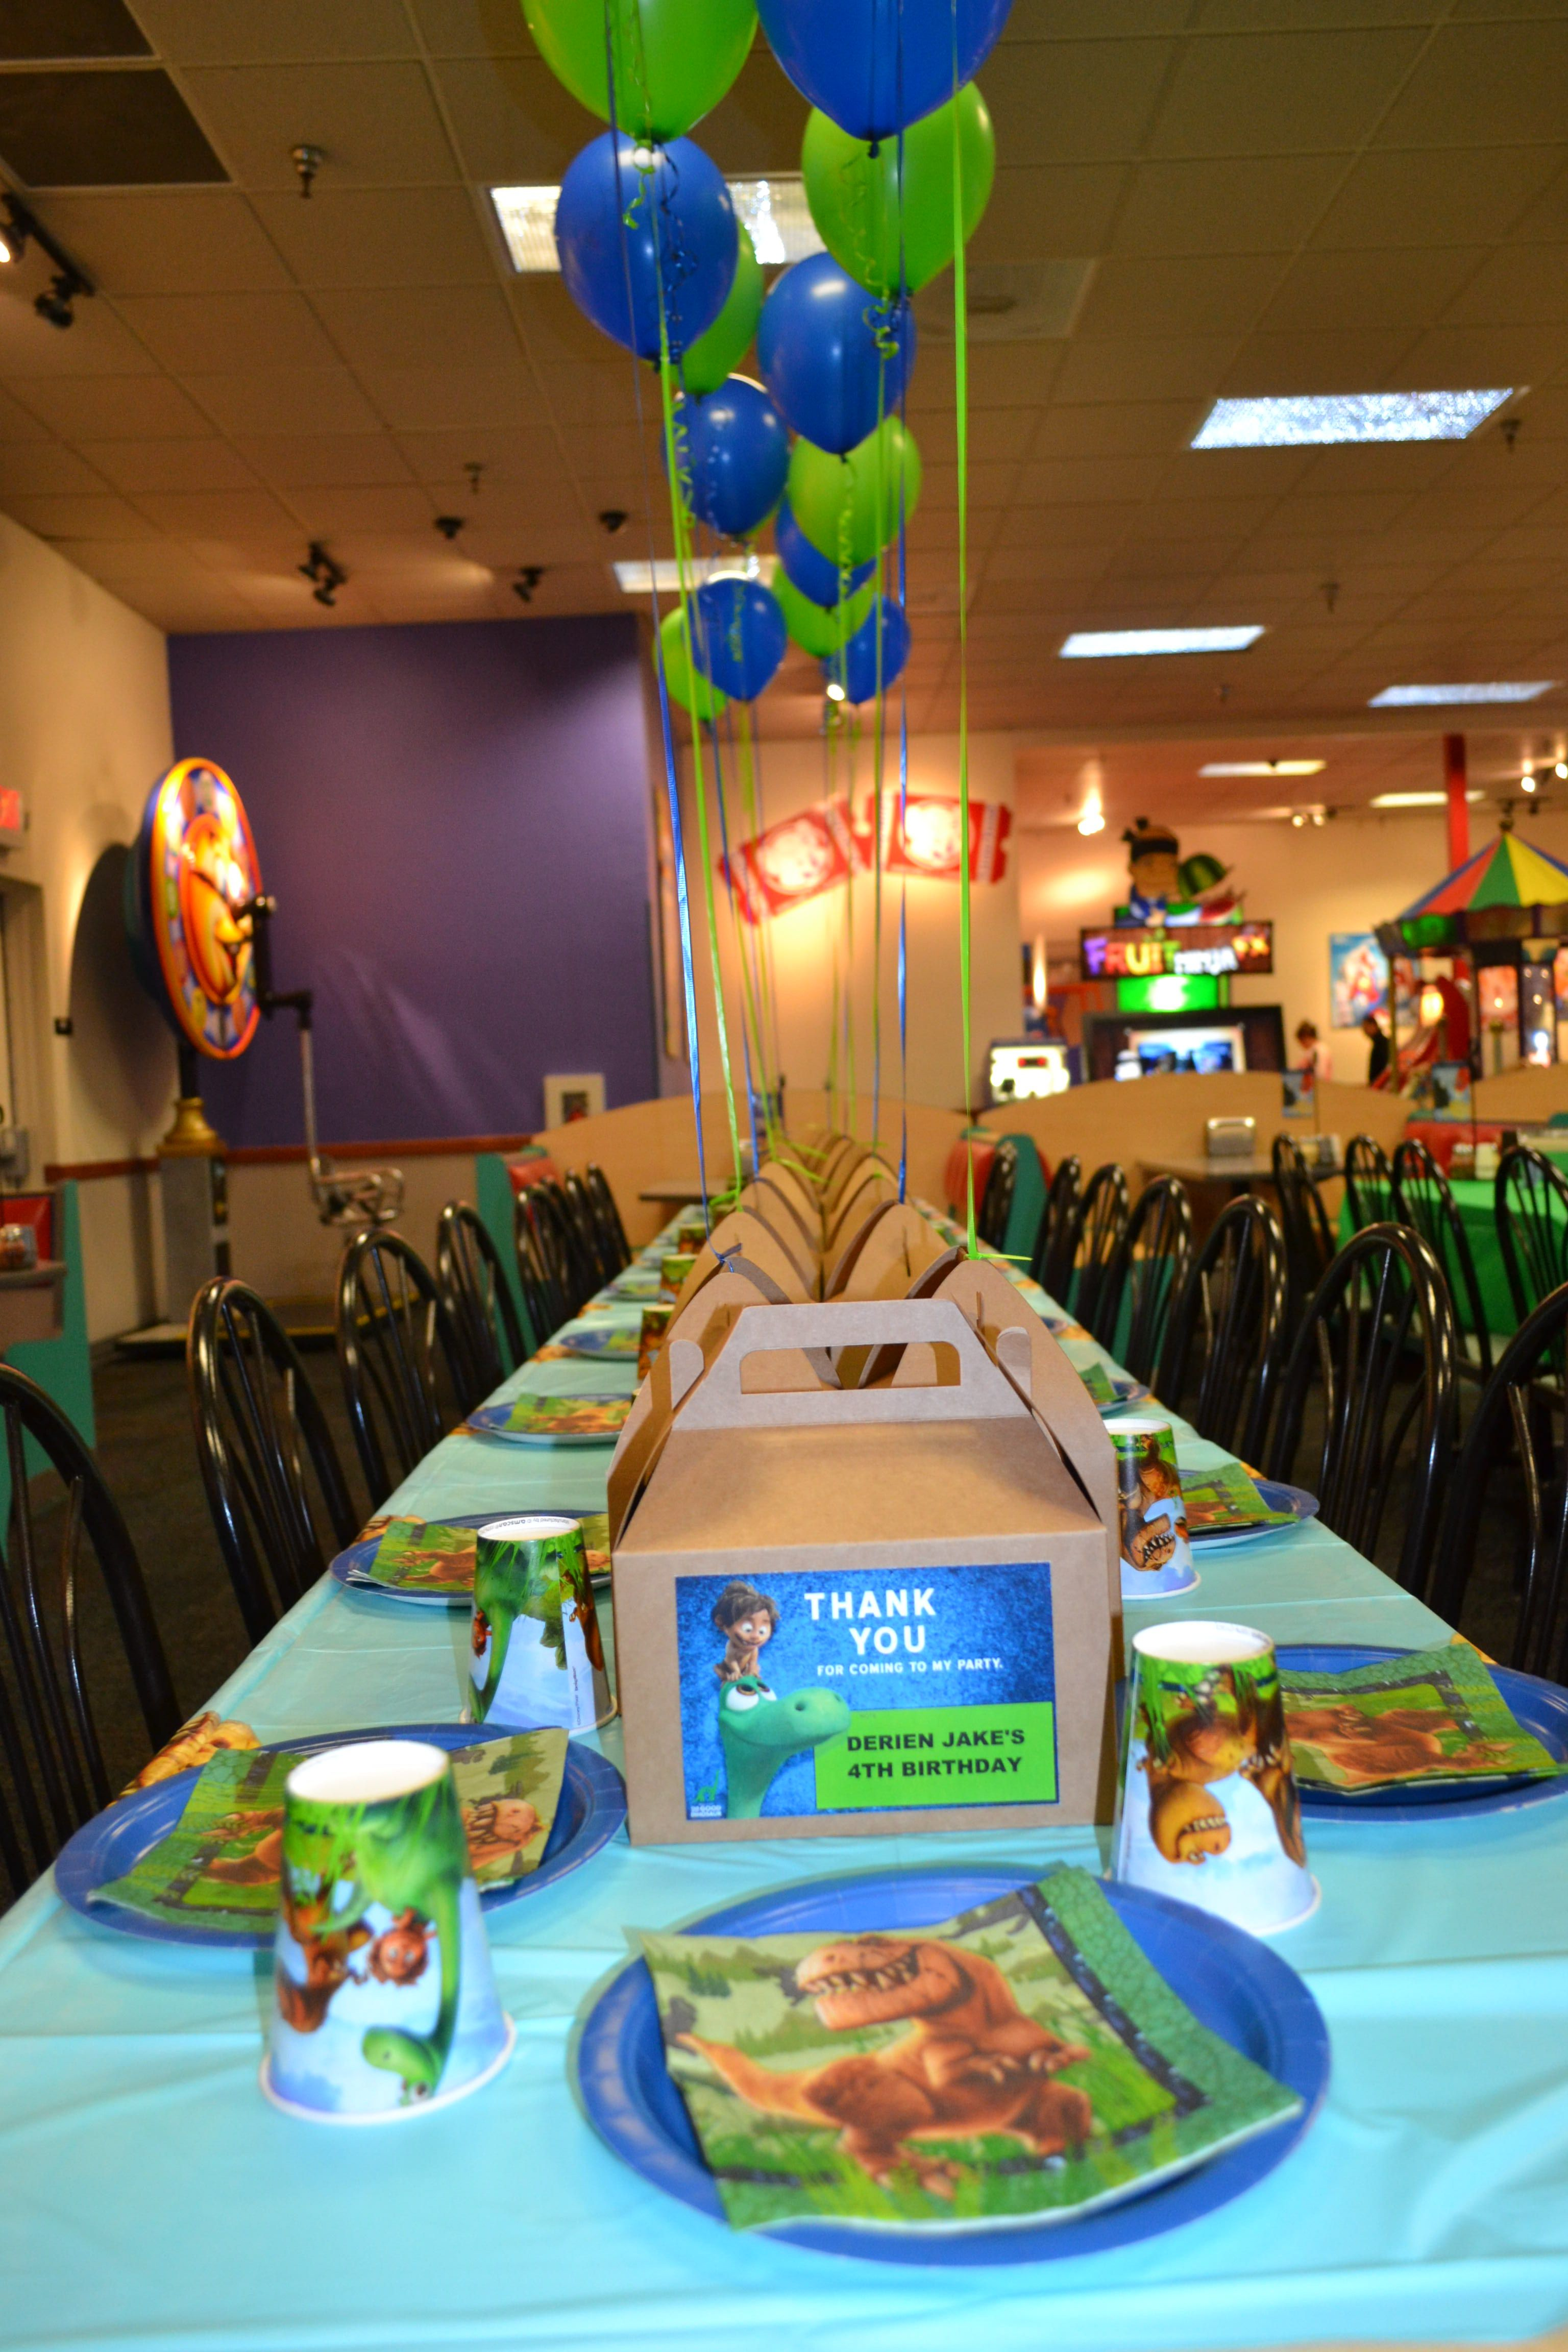 DJ's 4th Birthday Table Decor - The Good Dinosaur Theme ...